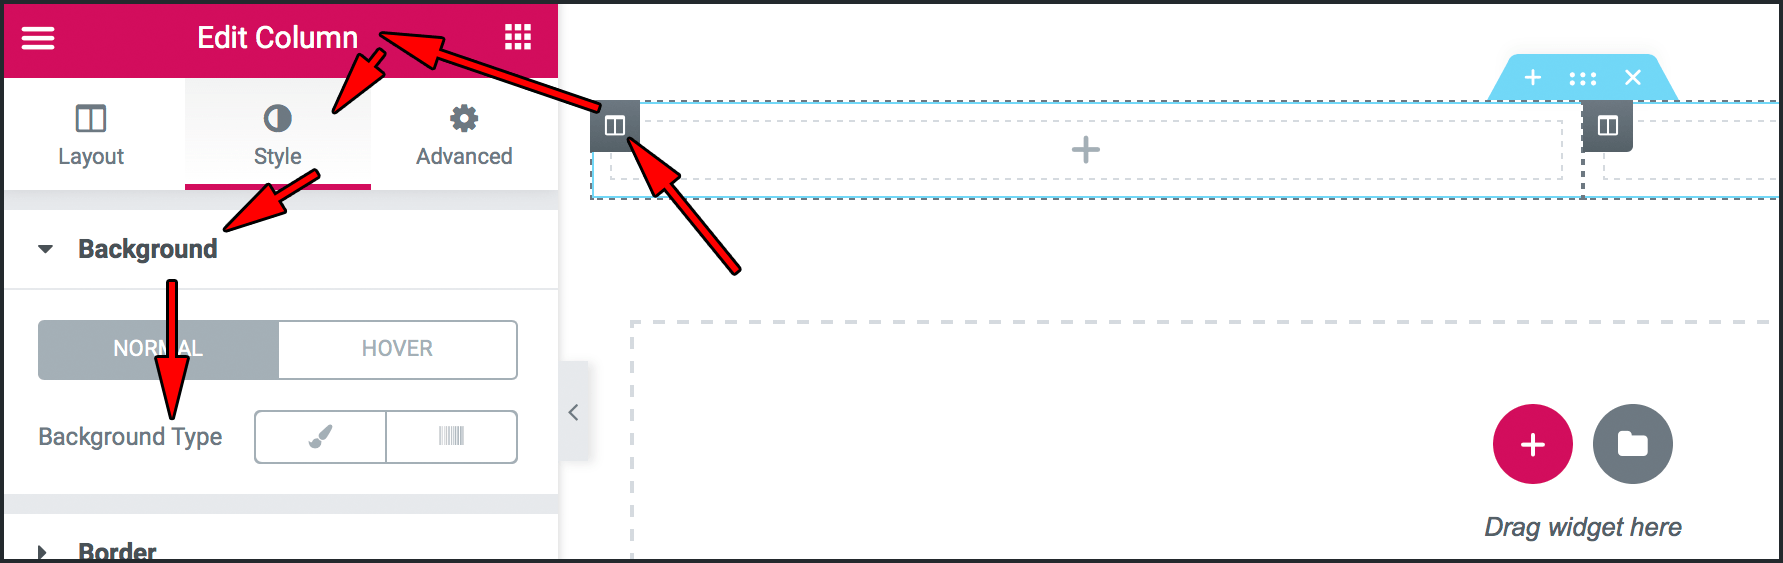 Edit Column 패널